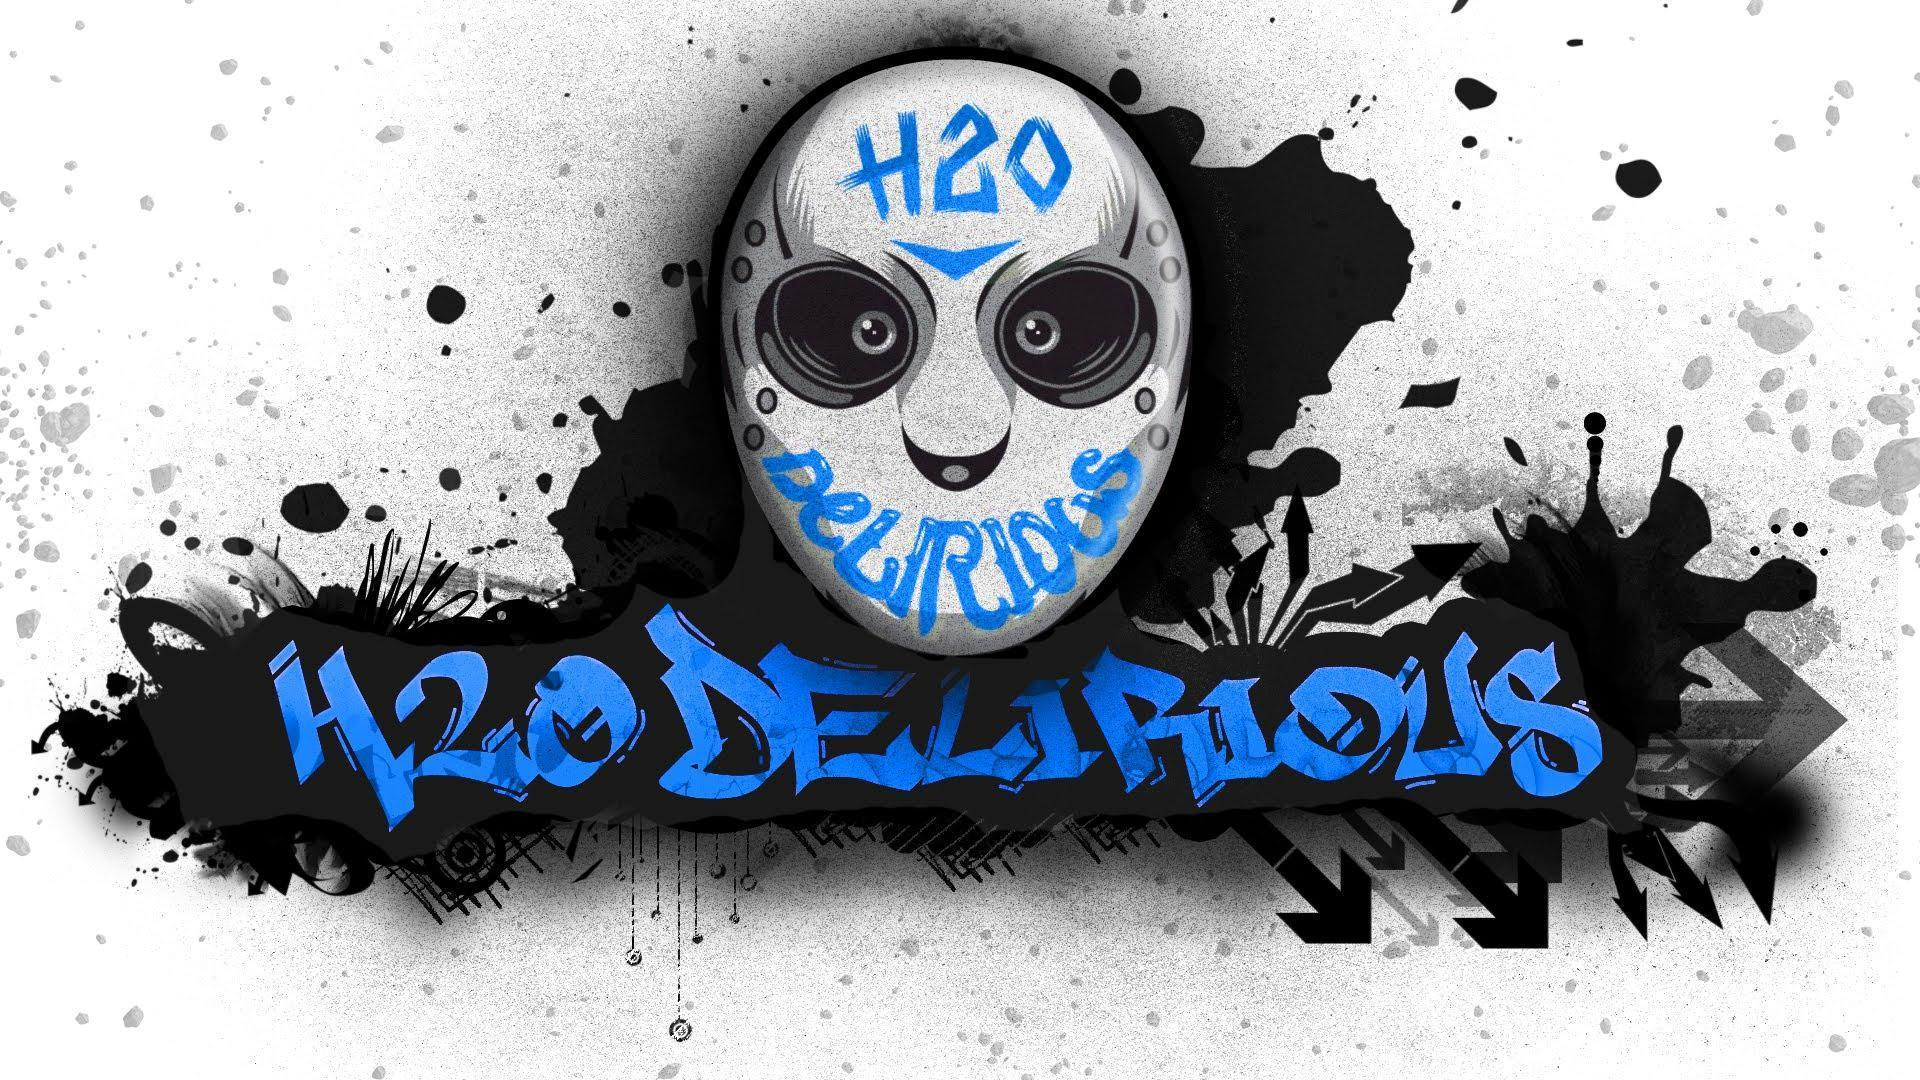 http://wallpapercave.com/wp/wp1856914.jpg H20 Delirious Logo